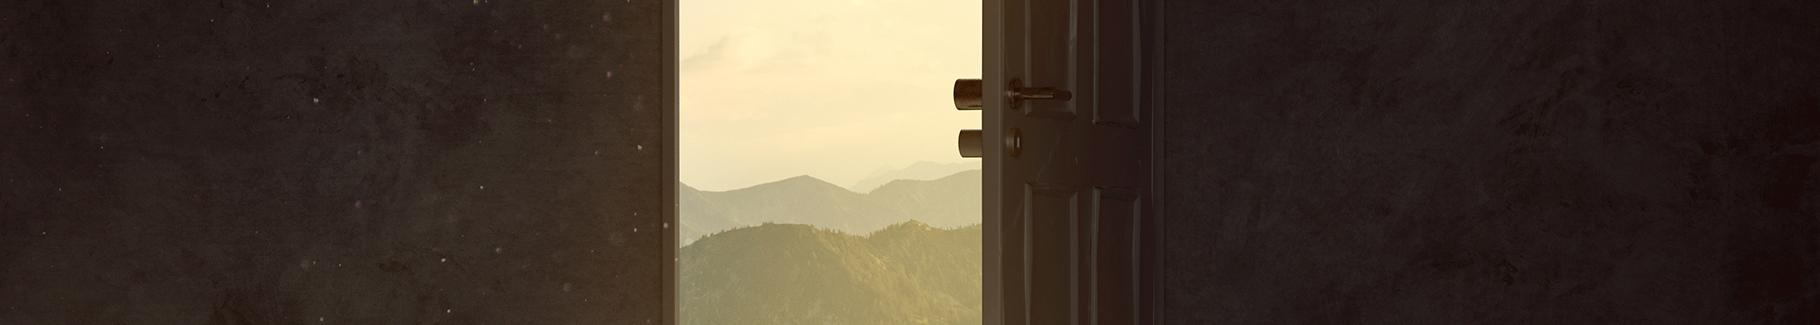 Fototapeta otwarte drzwi 3D